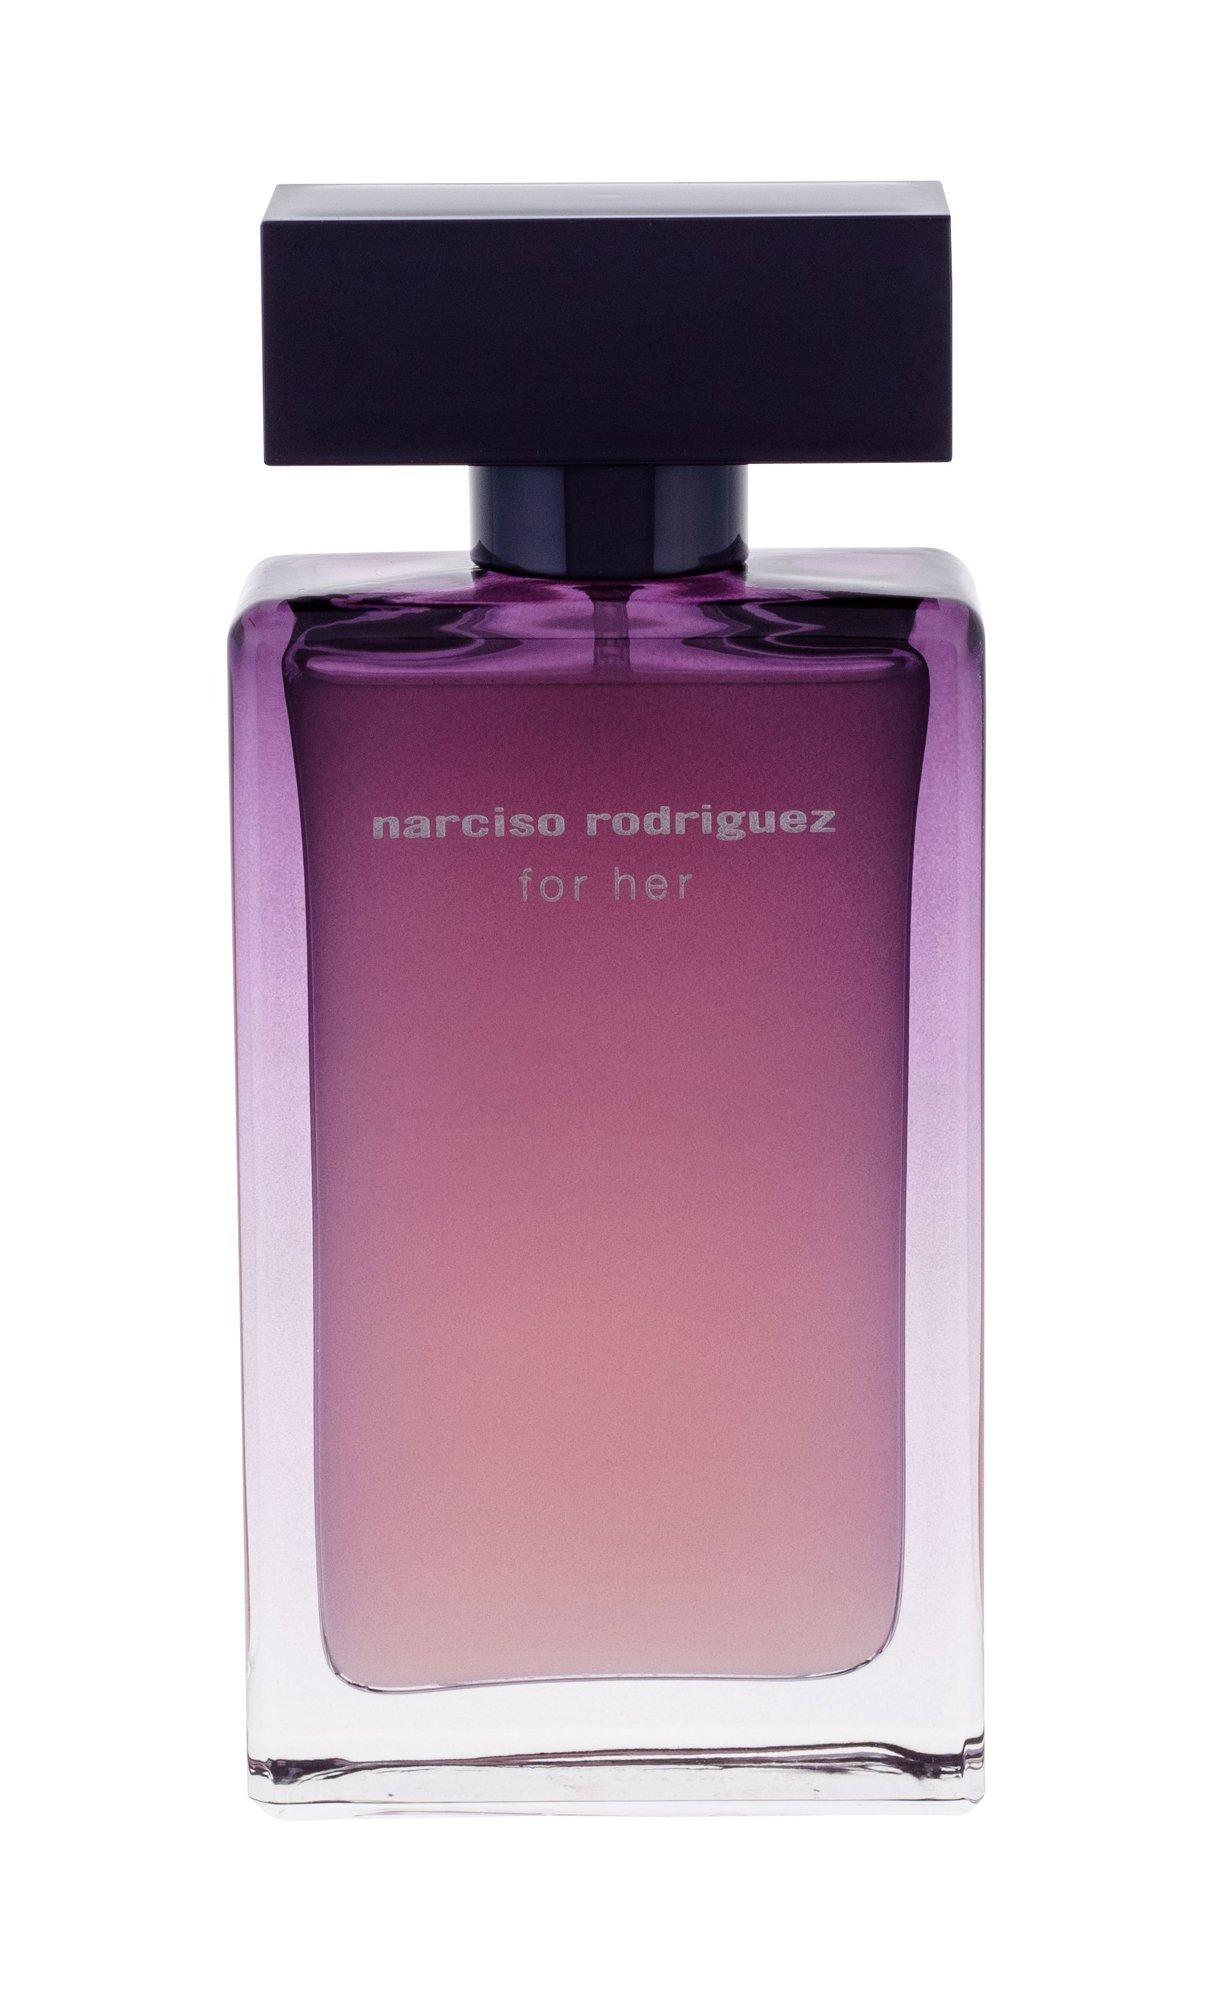 Narciso Rodriguez For Her Delicate Limited Edition Eau de Toilette EDT 75ml